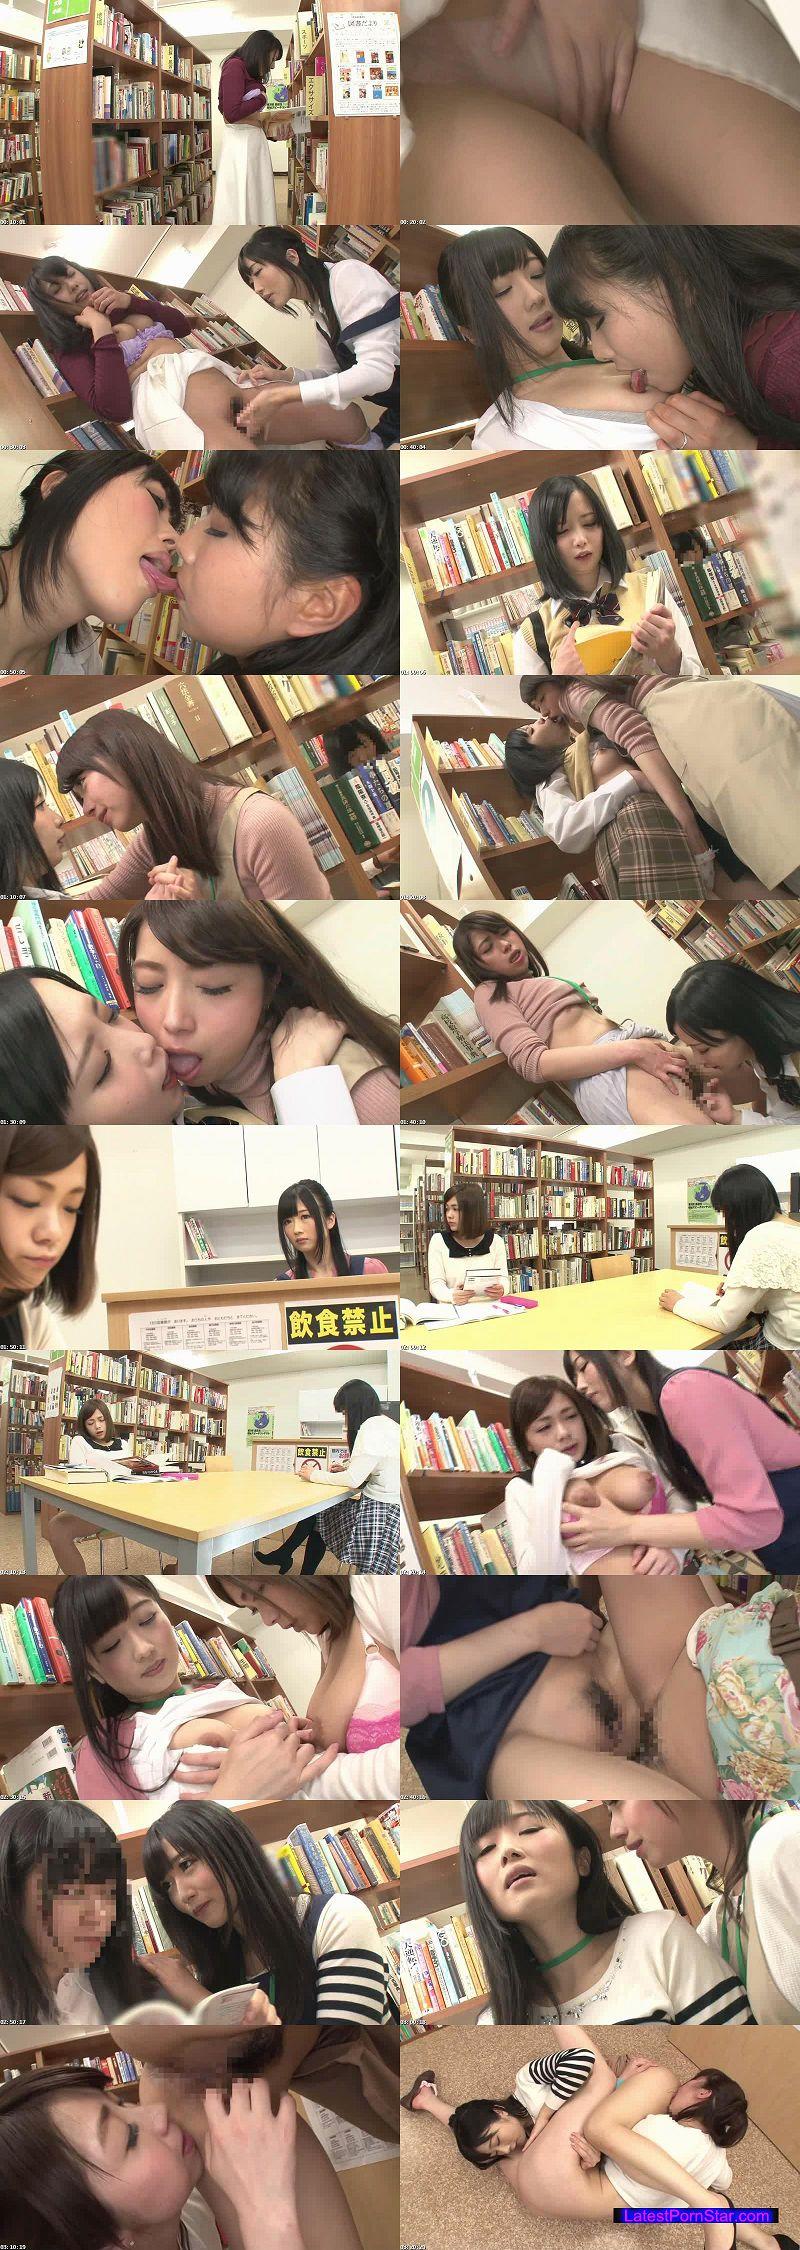 [HUNTA-017] 司書の私(レズビアン)が勤める図書館には時々、恥ずかしそうにしながらHな書籍(官能小説、How to本、ヌード本など)を探しに女子がやって来る。 4